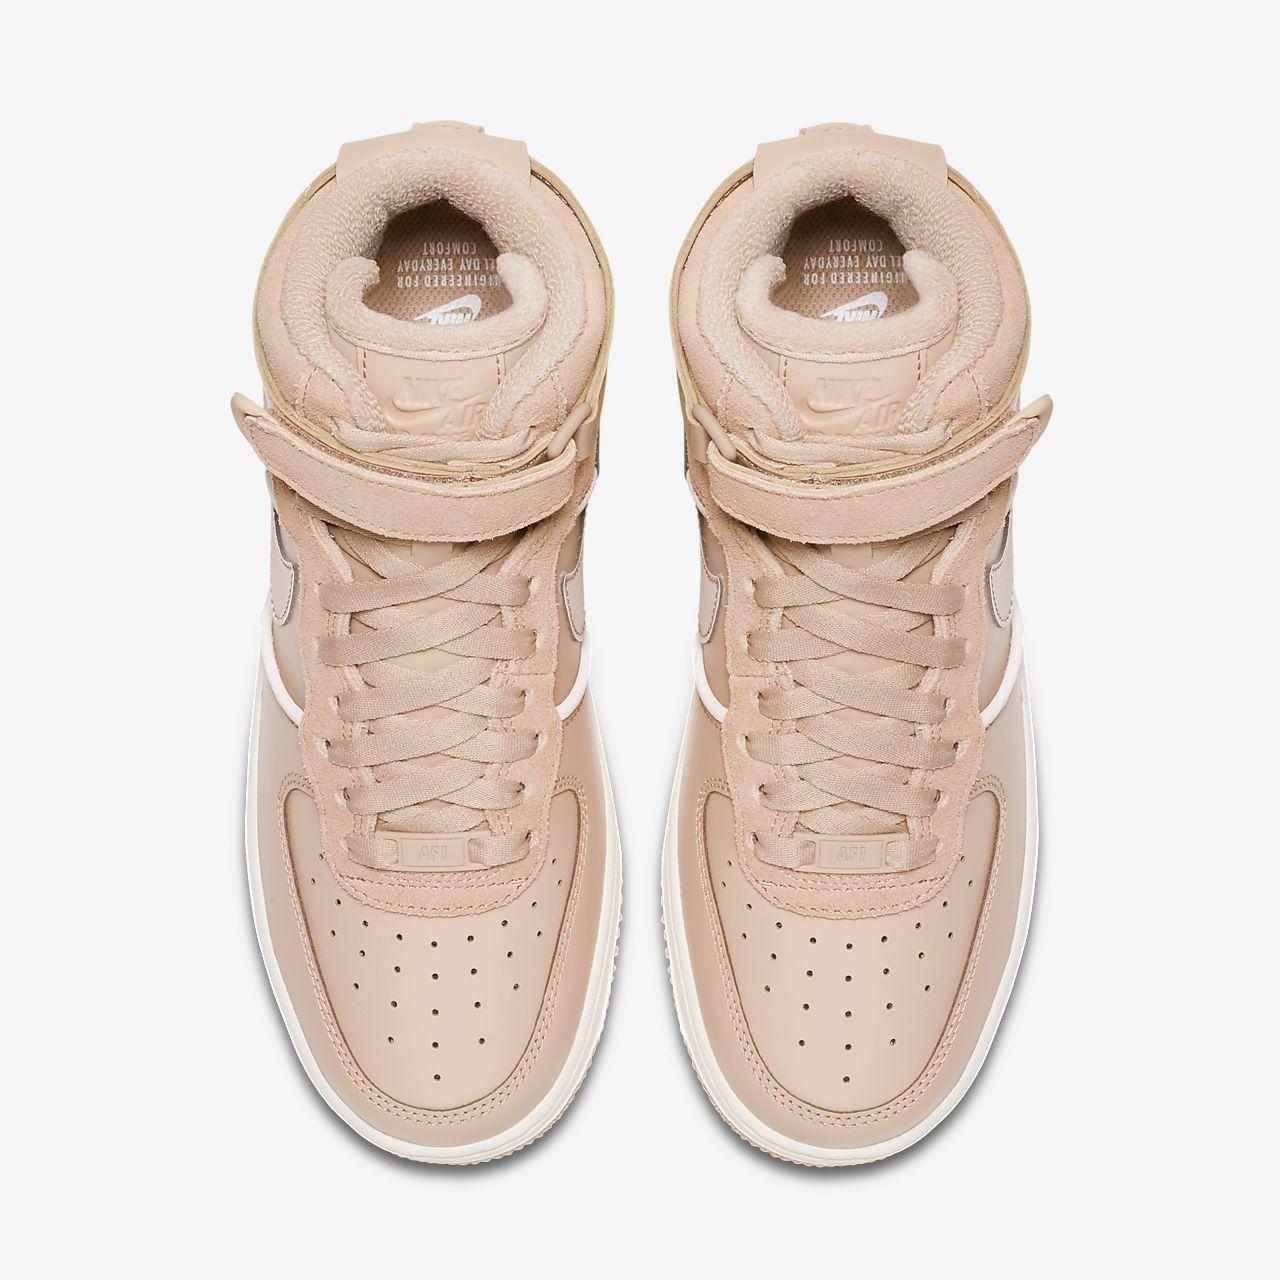 Nike Air Force 1 High Winterized Damesschoen